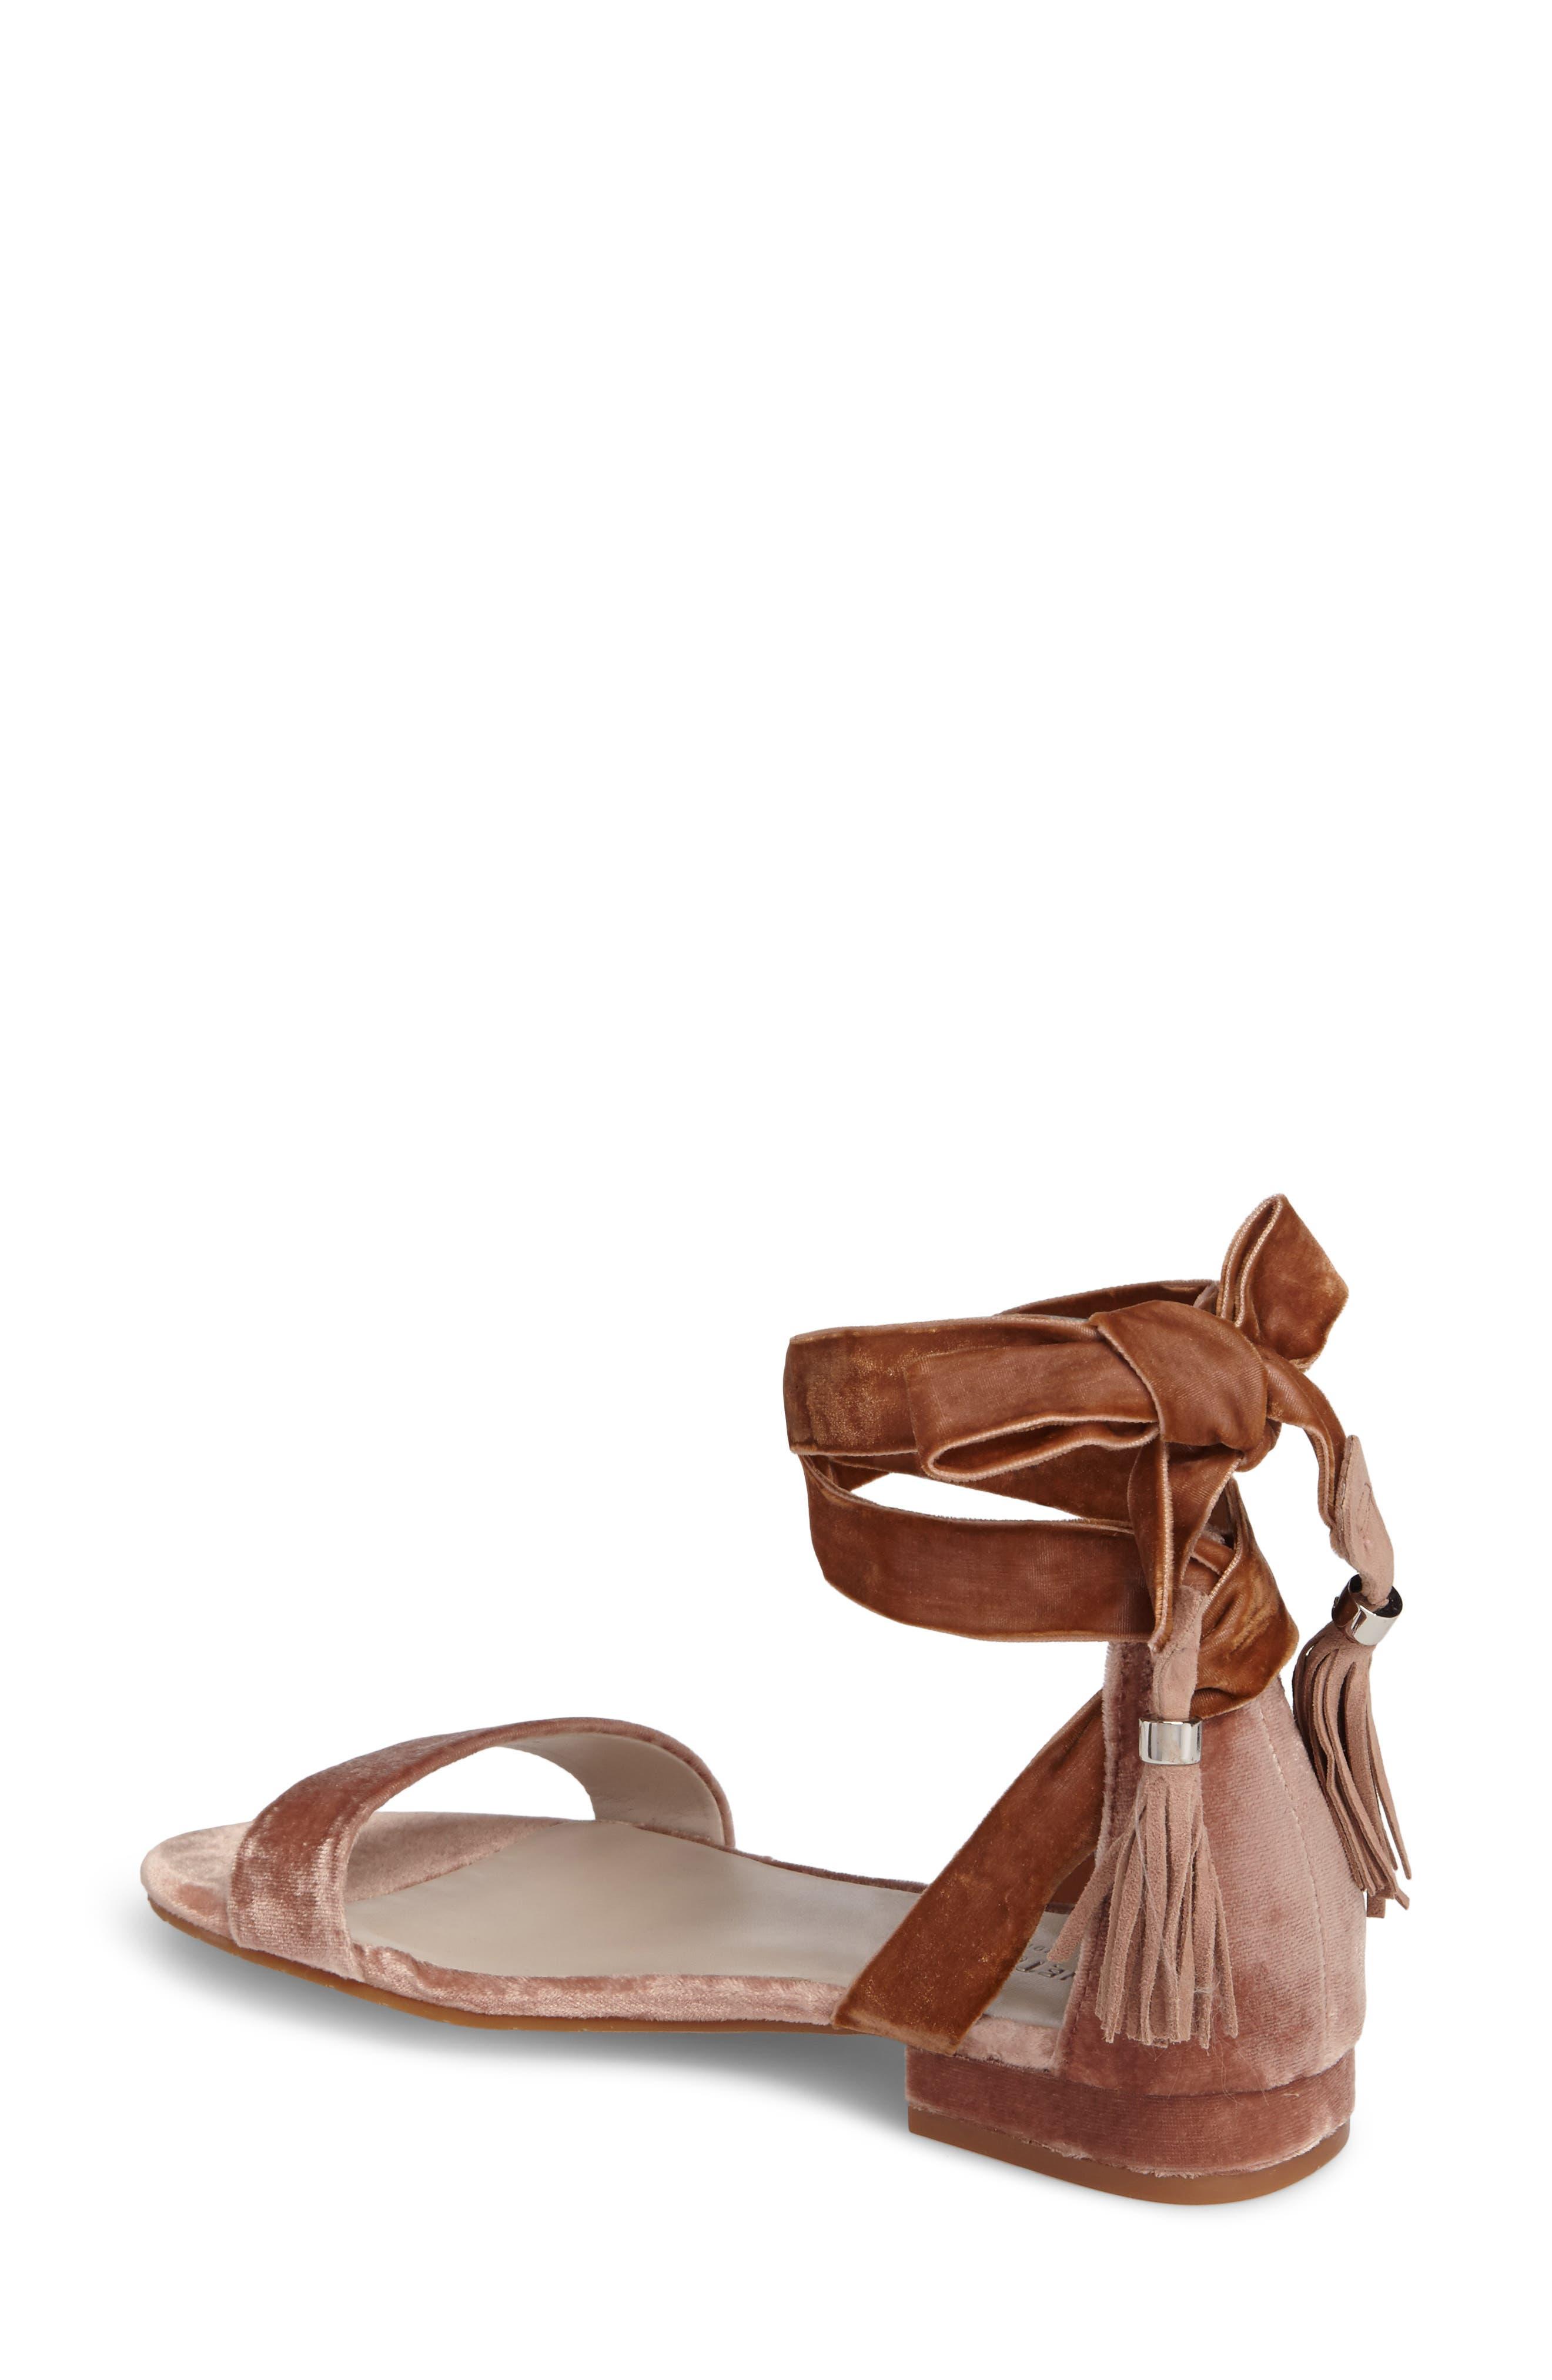 Valen Tassel Lace-Up Sandal,                             Alternate thumbnail 19, color,